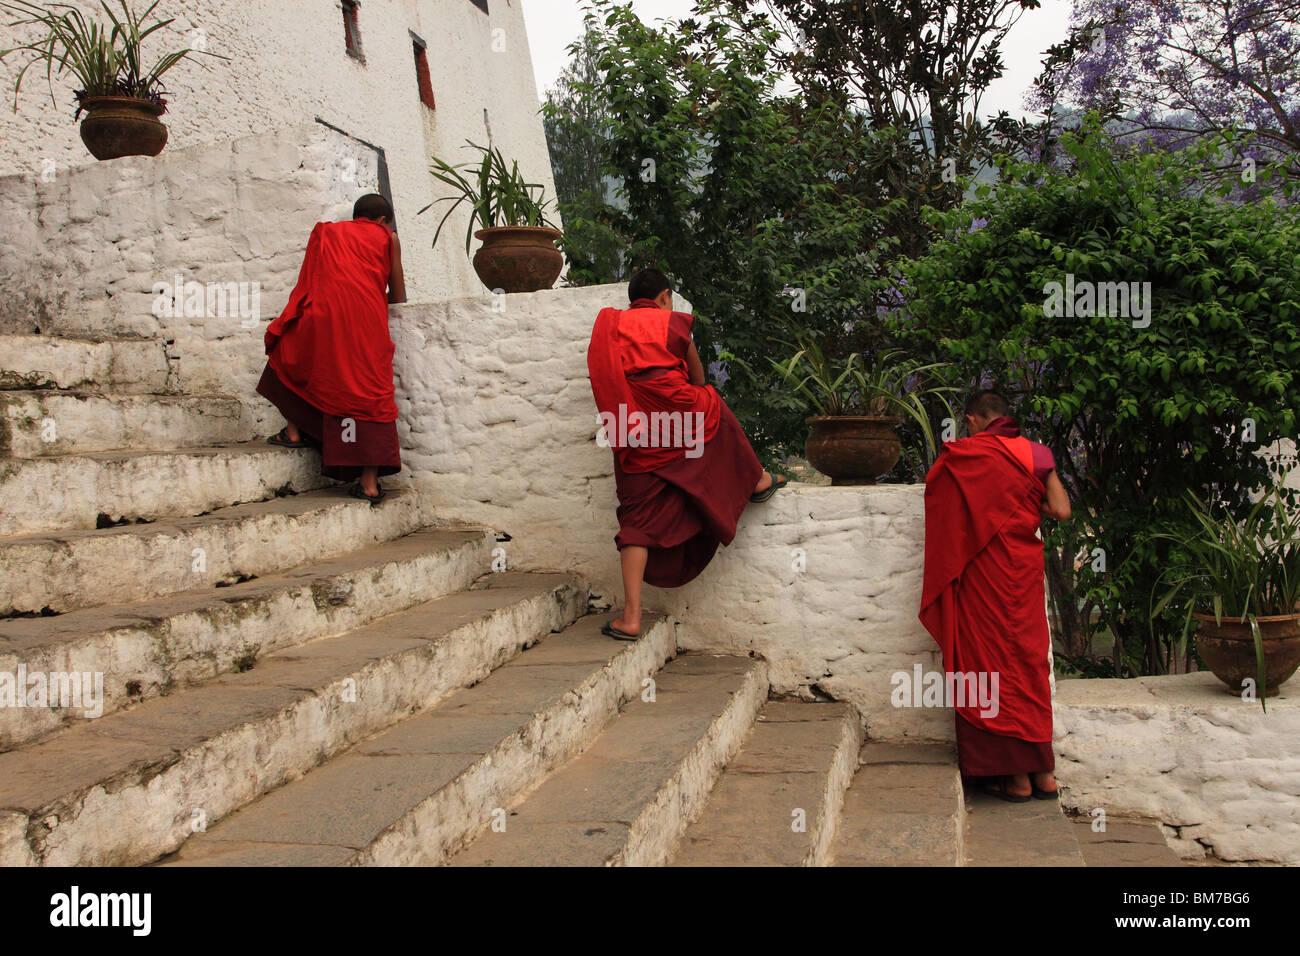 Buddist monks on the steps of Punakha Dzong, Bhutan Stock Photo